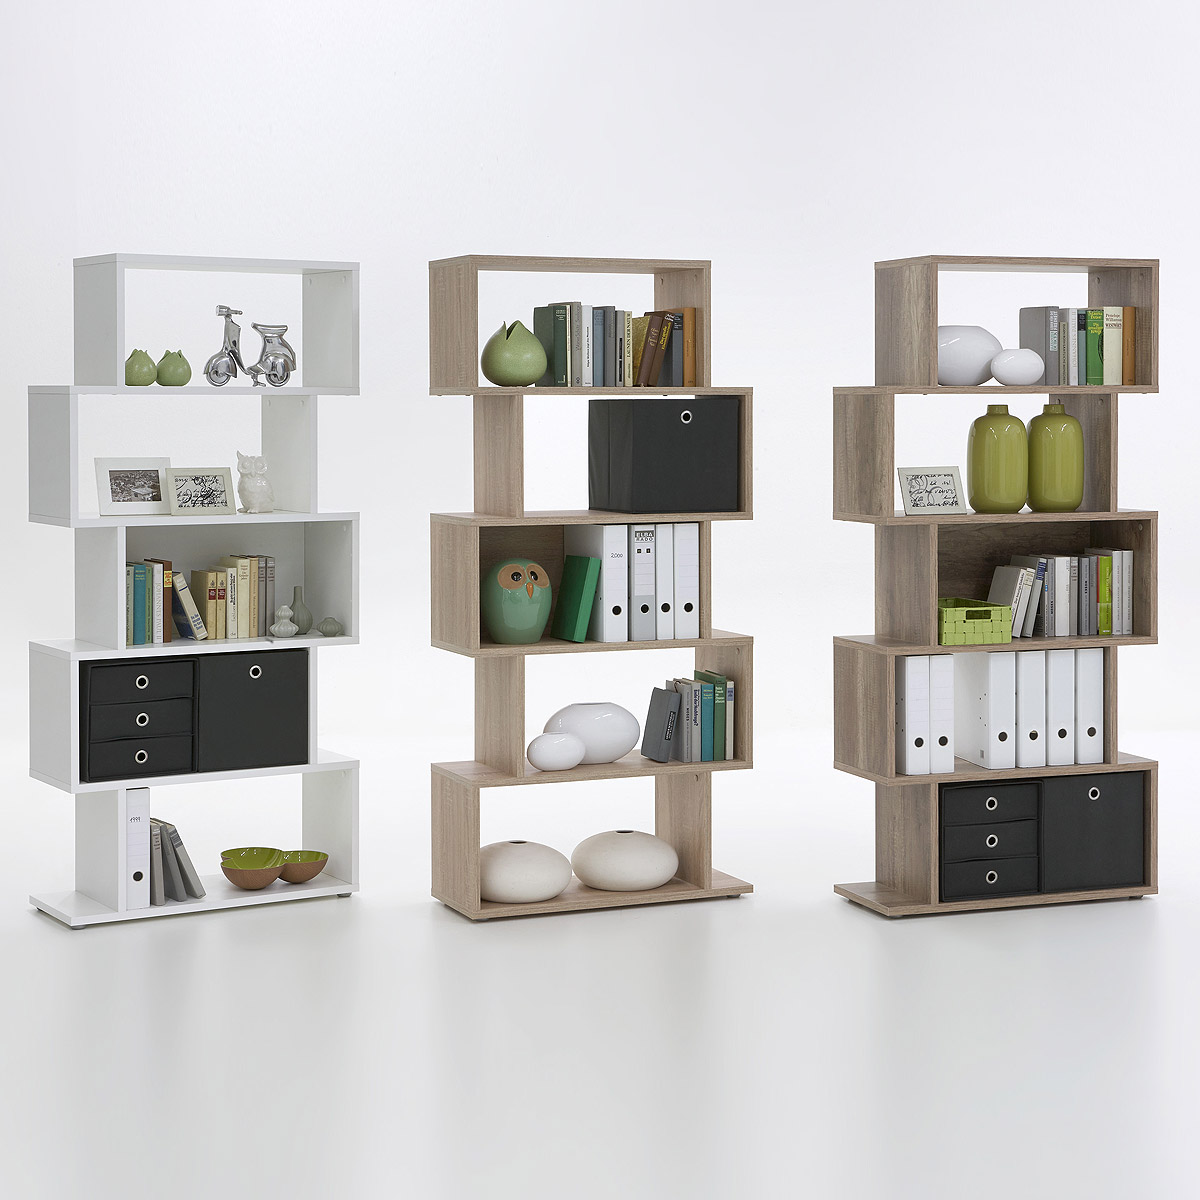 regal kubi raumteiler ausf hrung w hlbar wei eiche oder. Black Bedroom Furniture Sets. Home Design Ideas